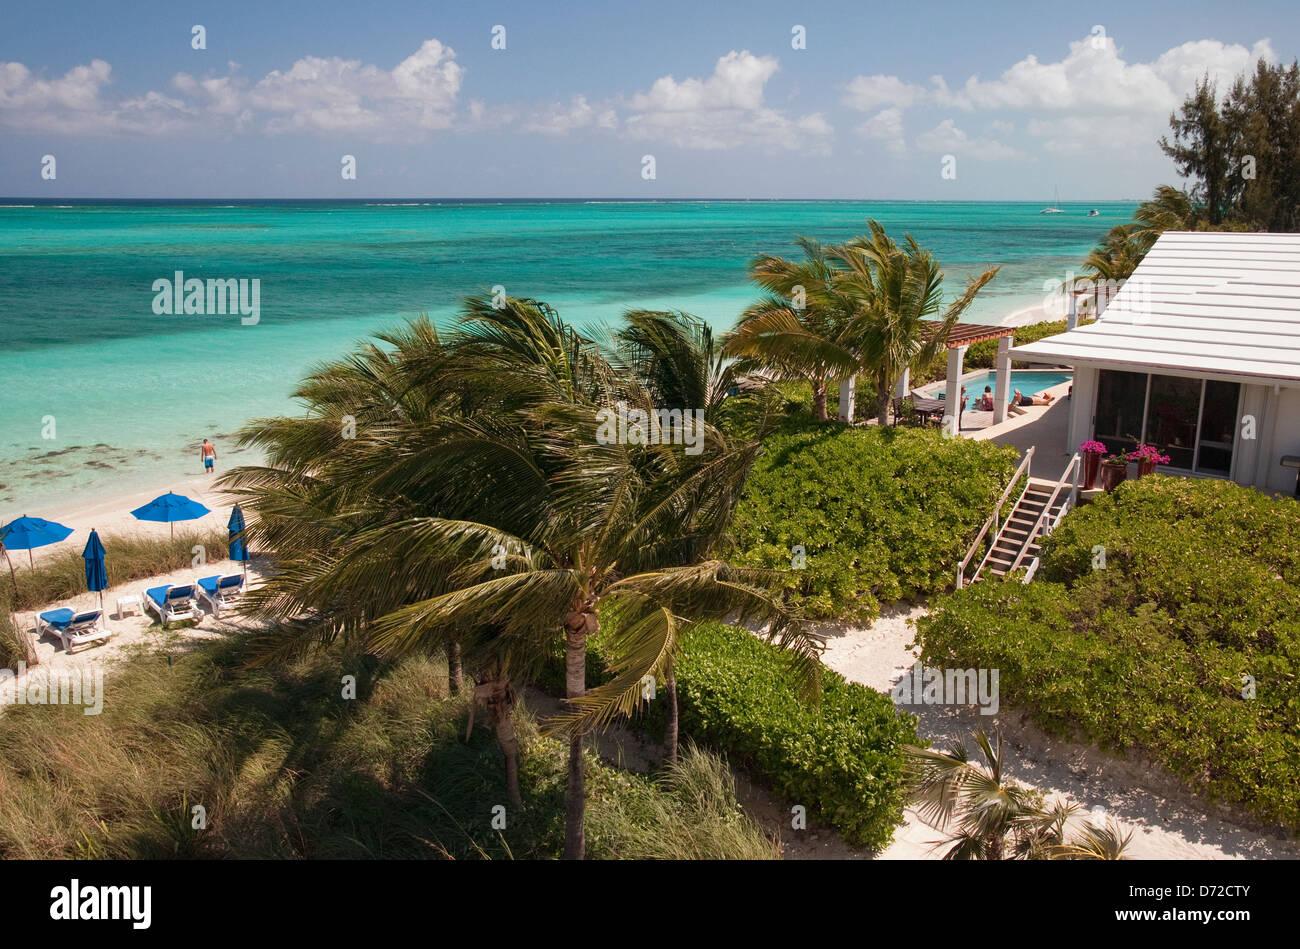 Turks & Caicos Stock Photos & Turks & Caicos Stock Images - Alamy